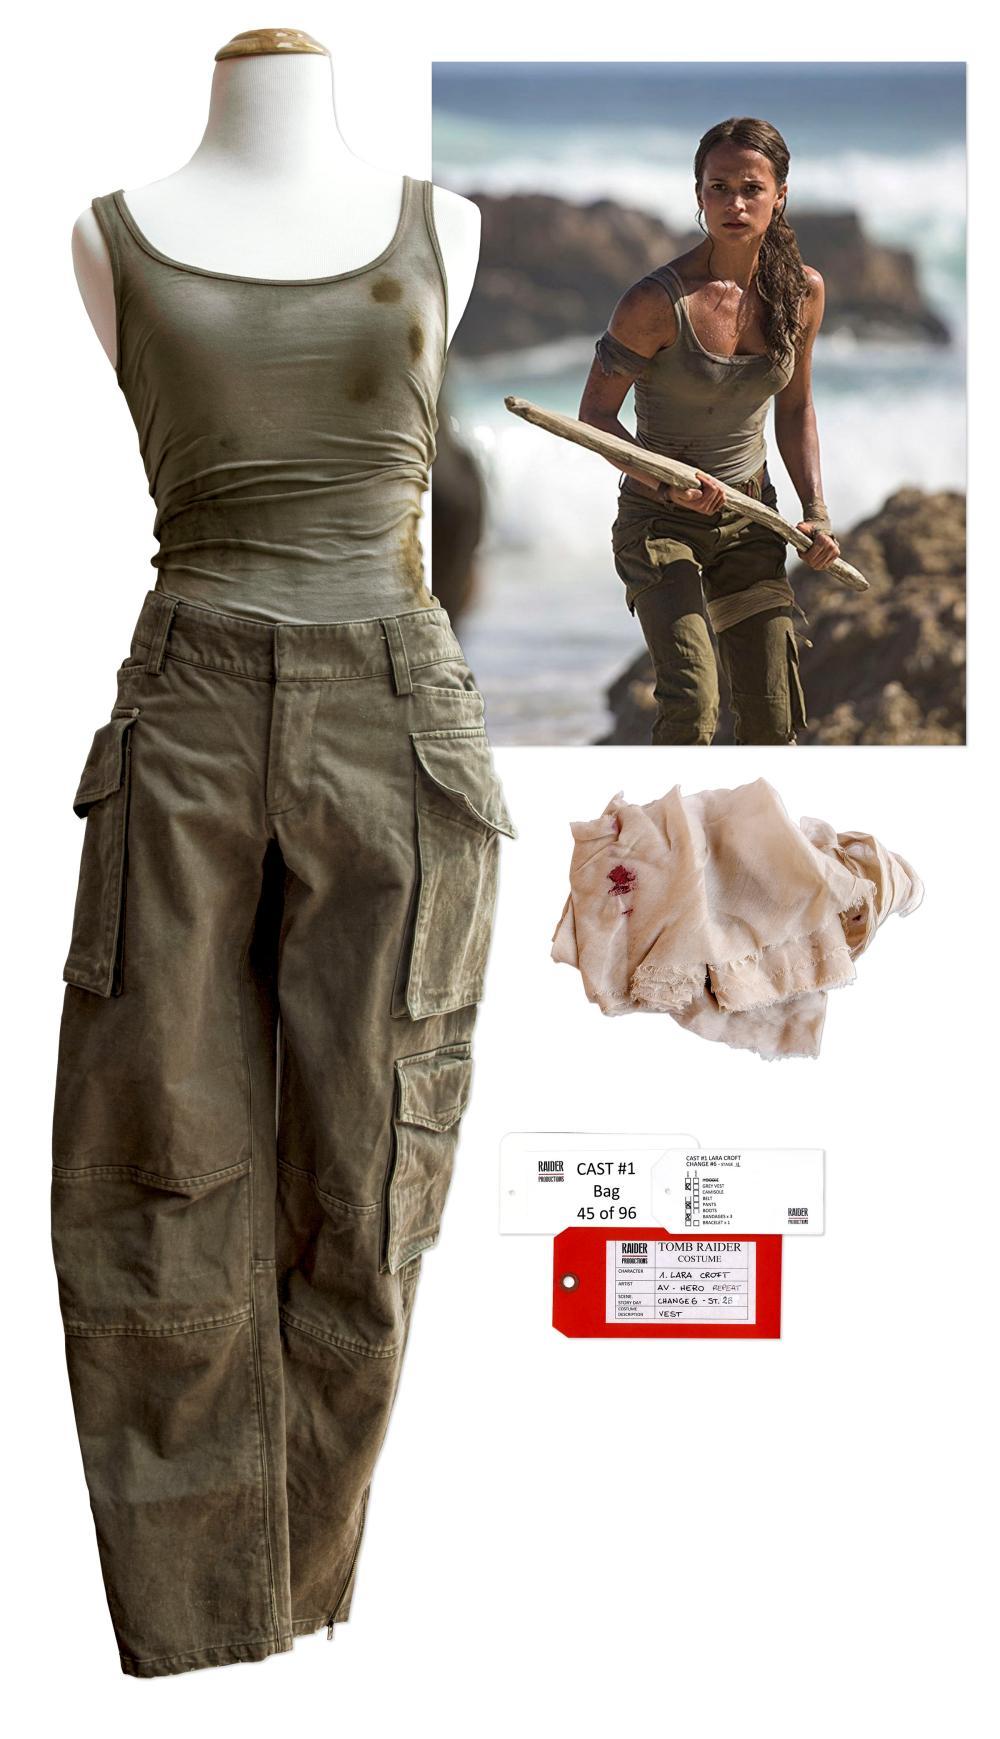 Alicia Vikander Worn Lara Croft Tomb Raider Costume Coa